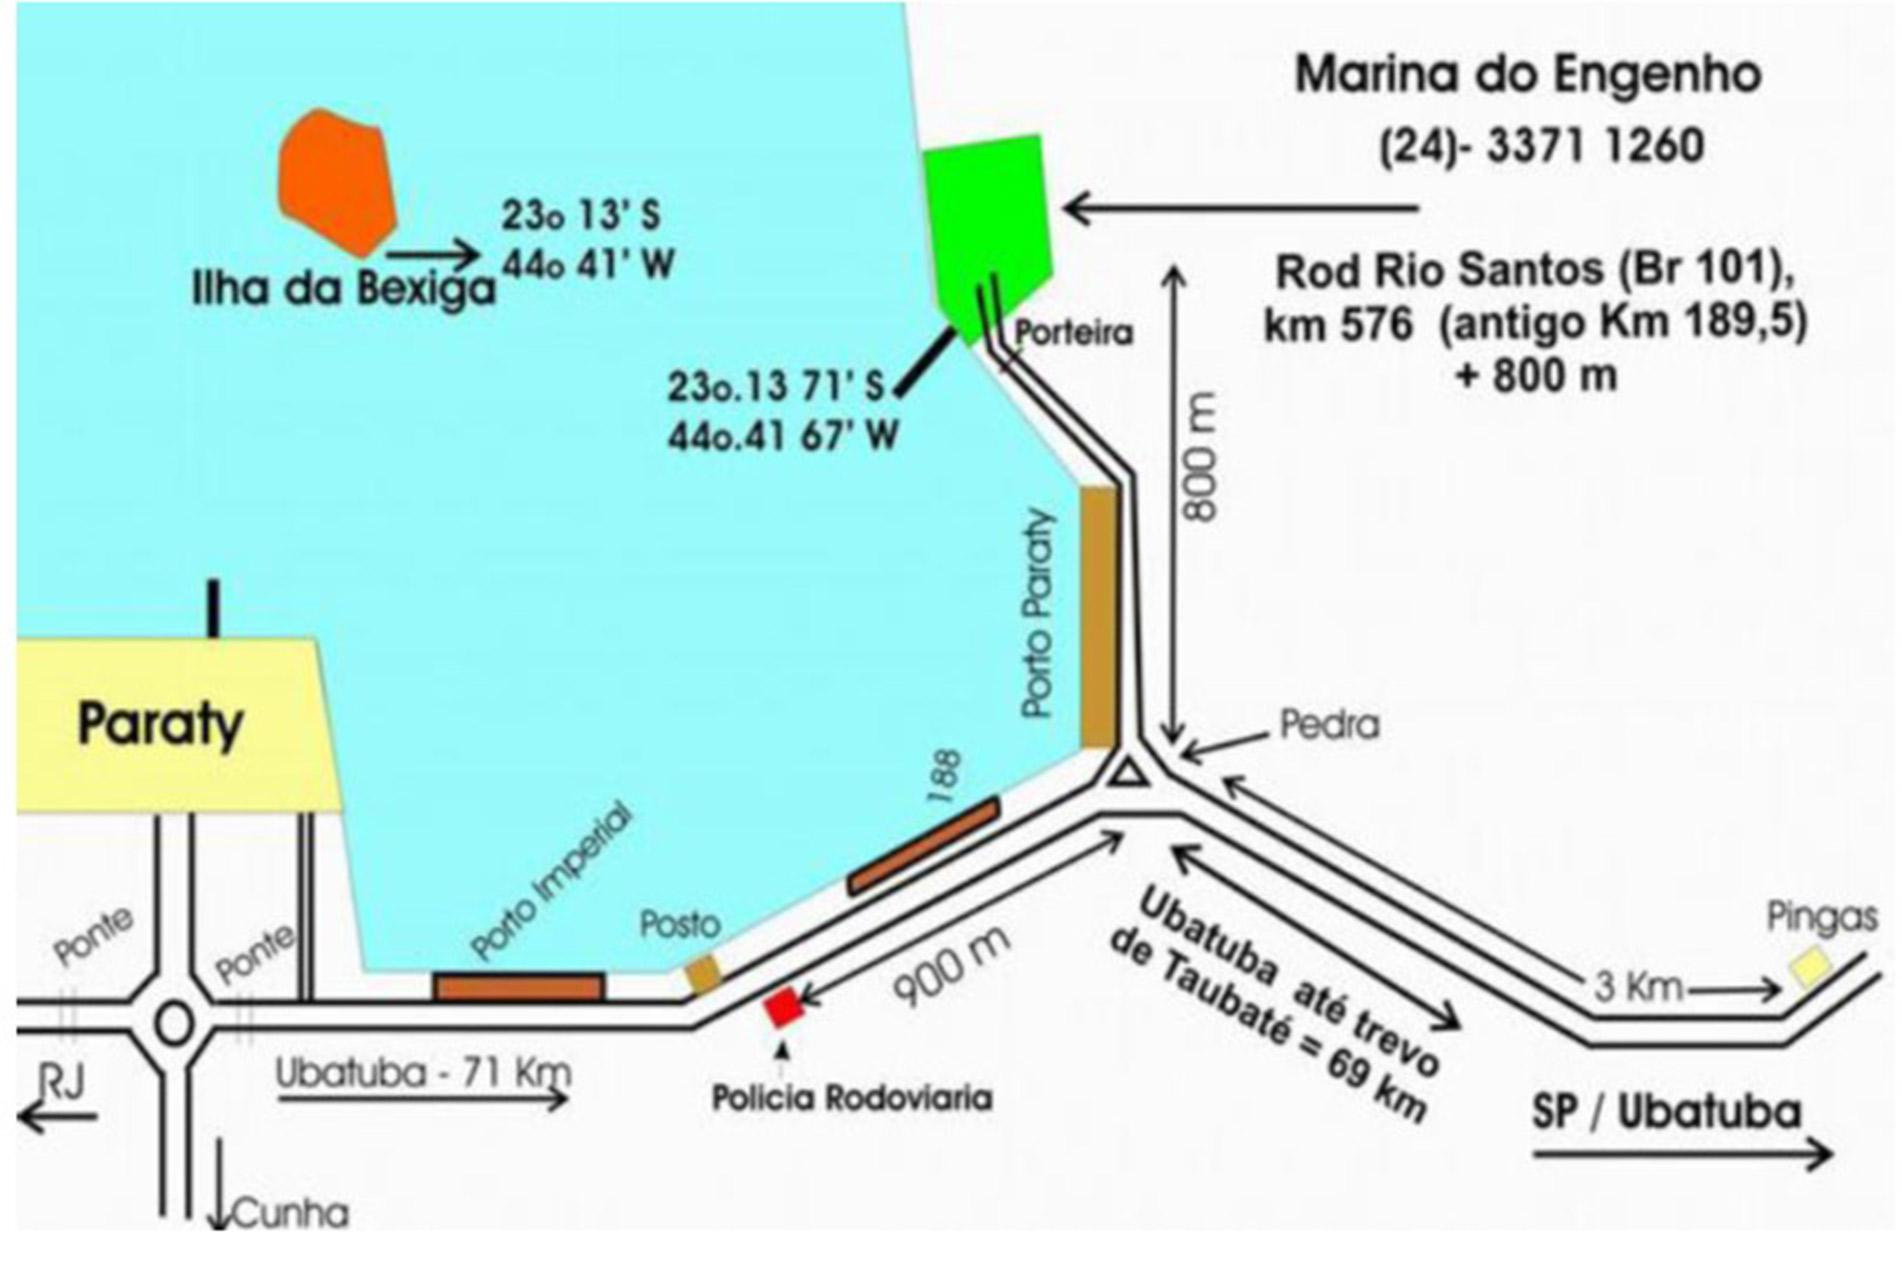 Paraty base map